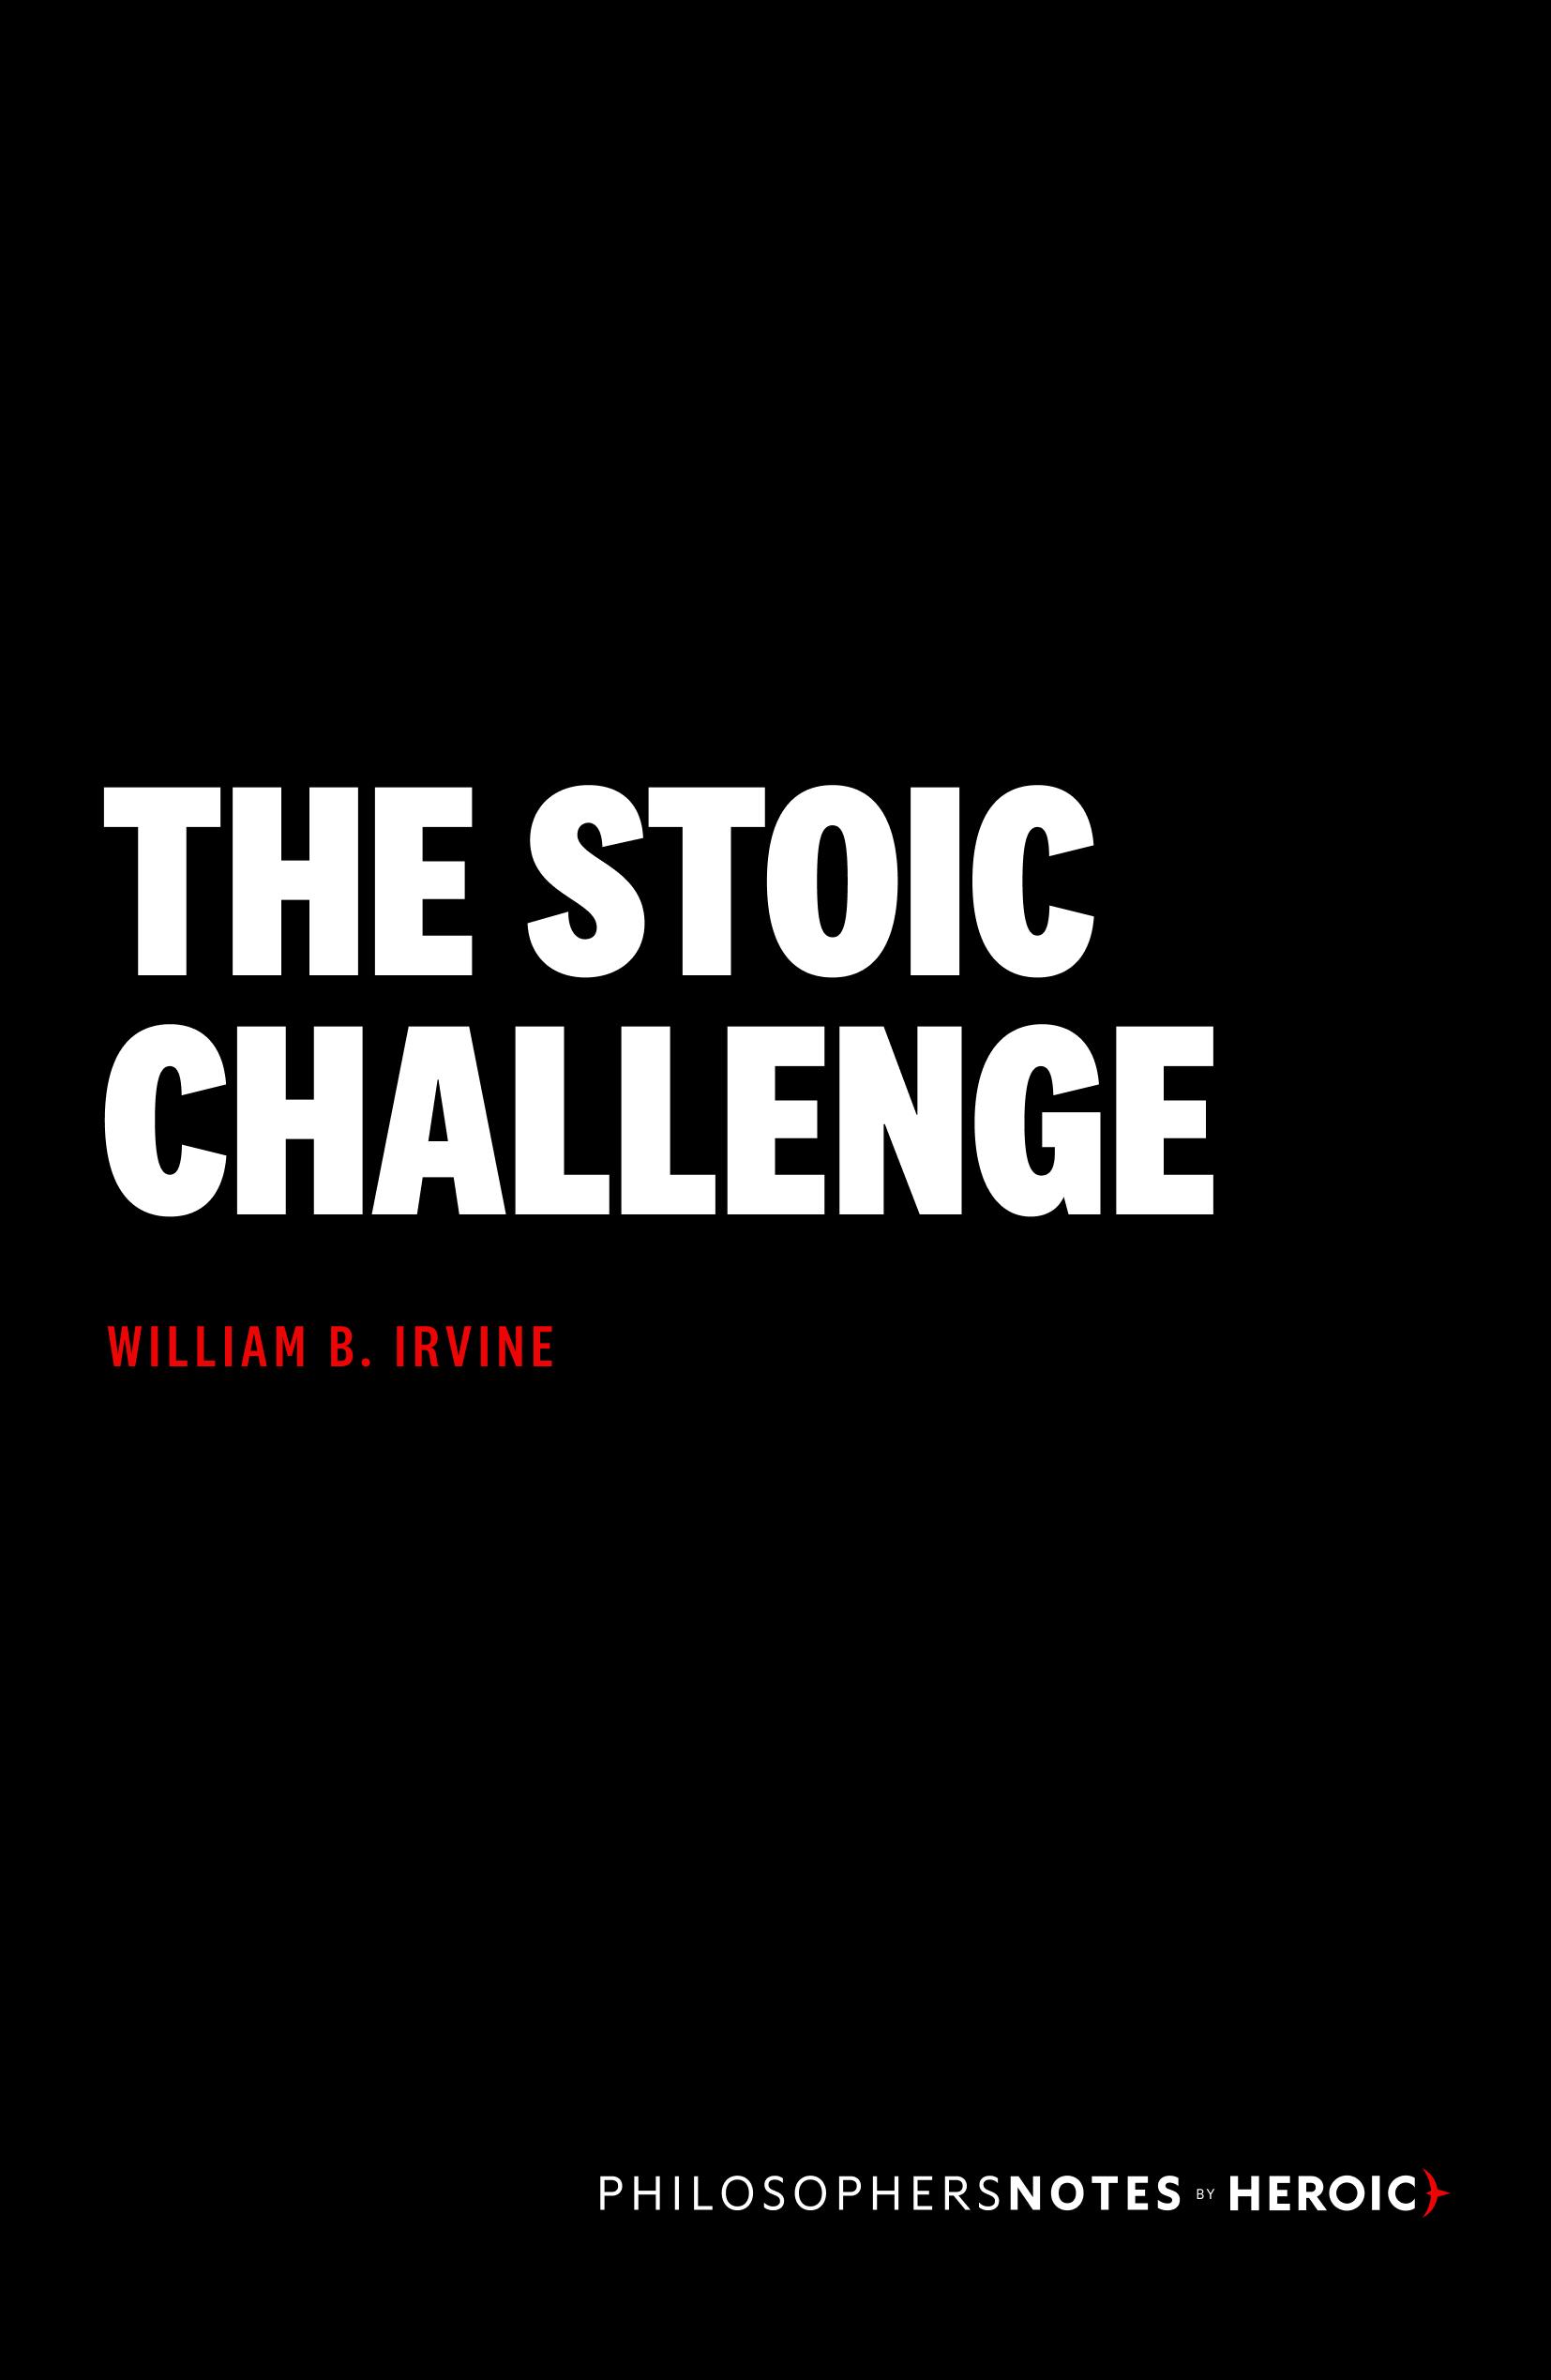 The Stoic Challenge